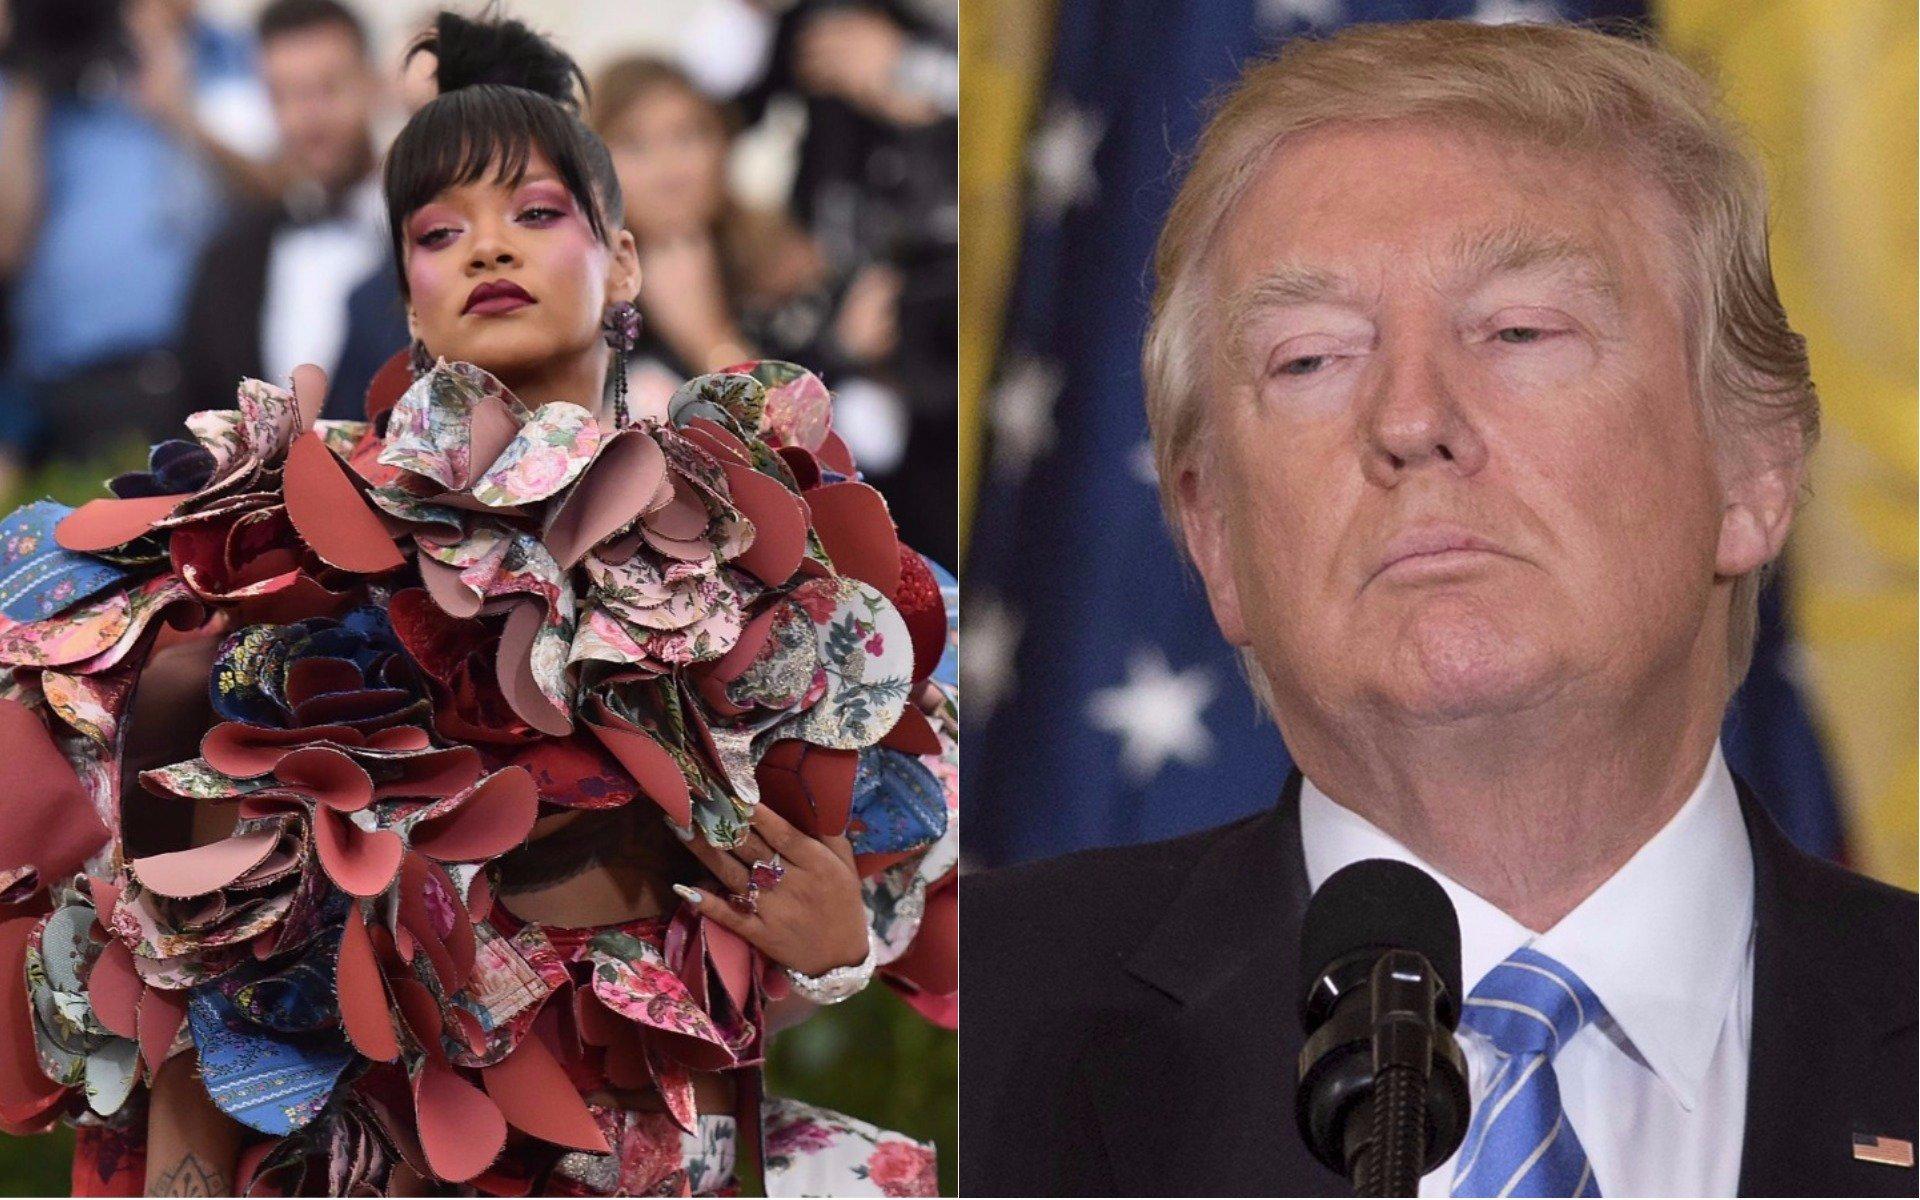 'Gay Bible' features Rihanna as God and Donald Trump as Satan https://t.co/9Im6FBOQjx https://t.co/BmYPzkv5dK